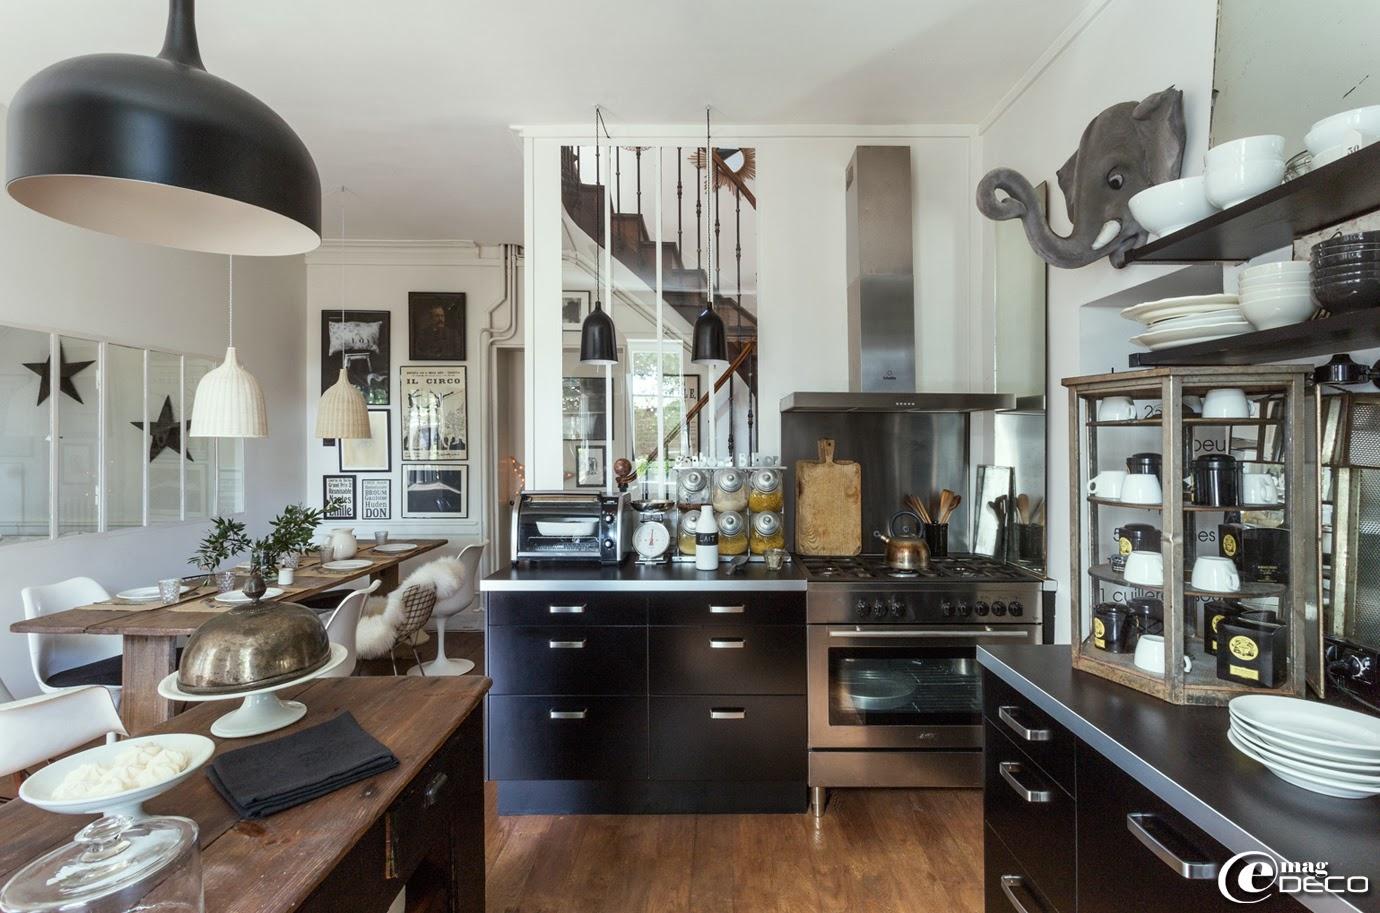 simple cuisine campagne ikea inspiration du gris dans la cuisine la vie with magasin ikea cuisine. Black Bedroom Furniture Sets. Home Design Ideas